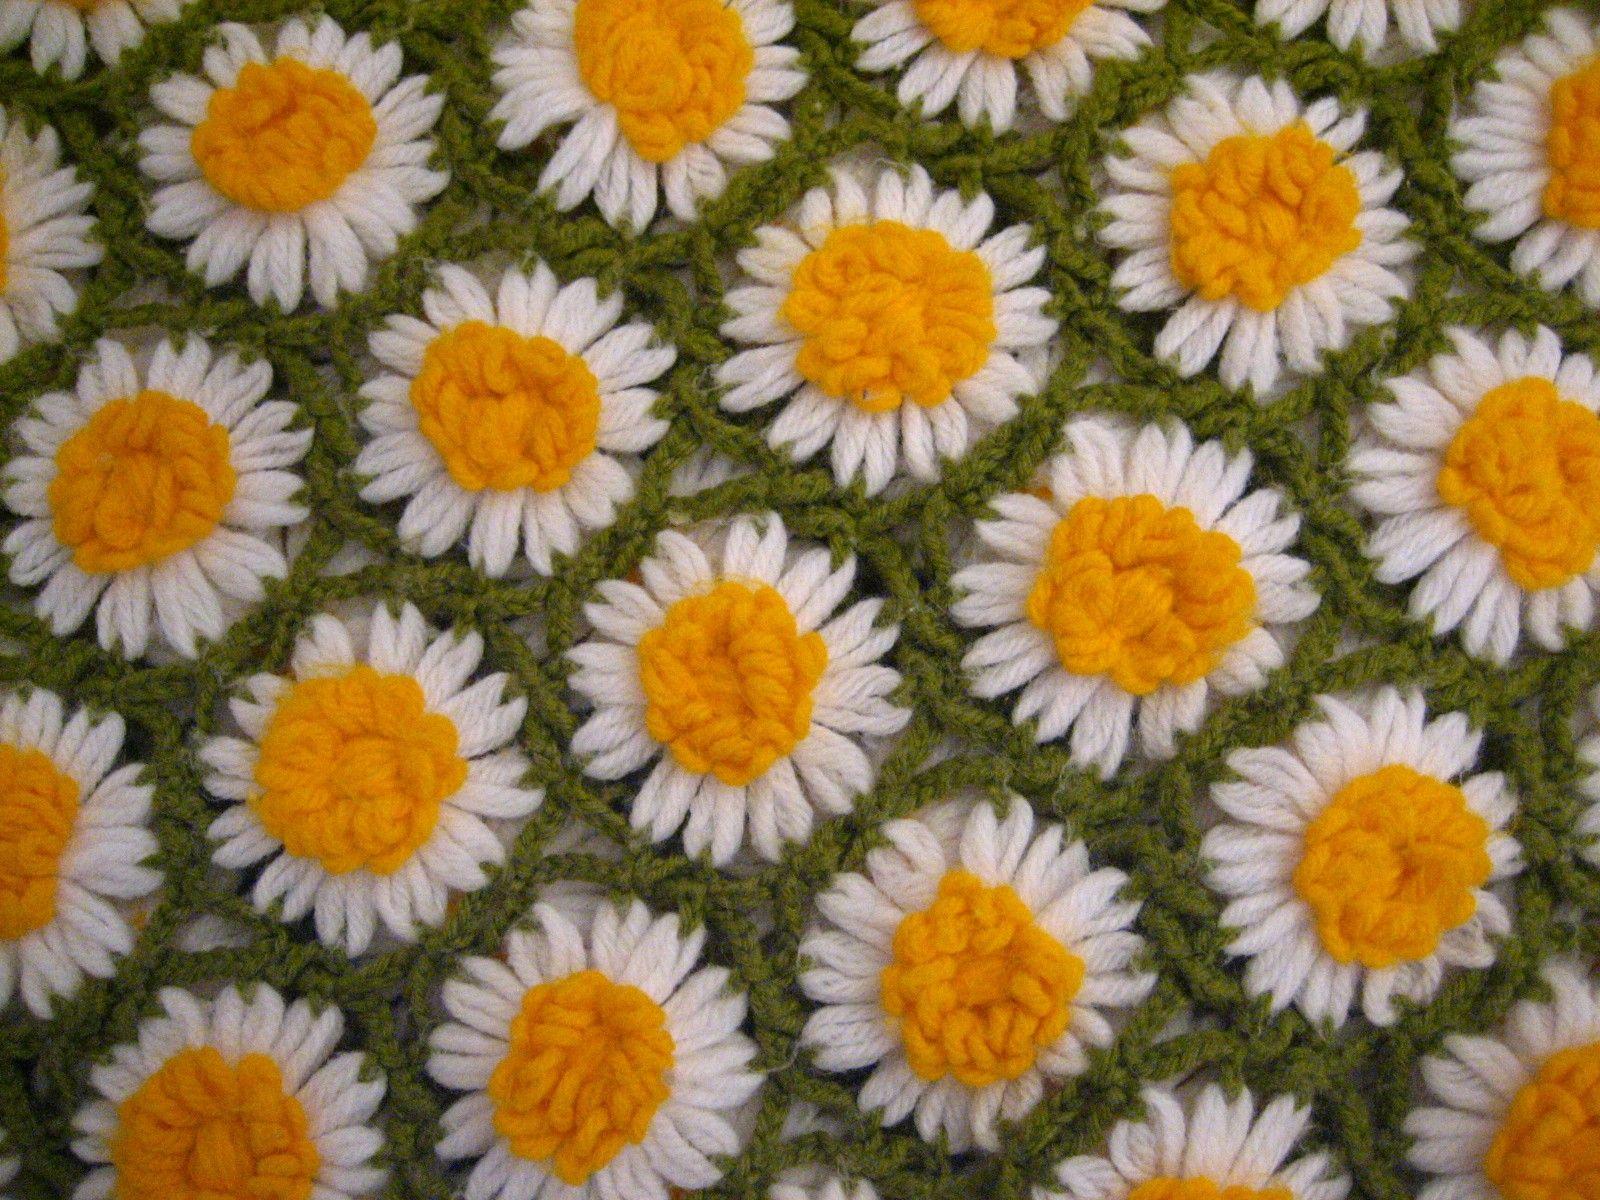 Crochet daisy blanket lovely crochet inspiration blankets crochet daisy blanket crochet quilt patternquilt bankloansurffo Choice Image